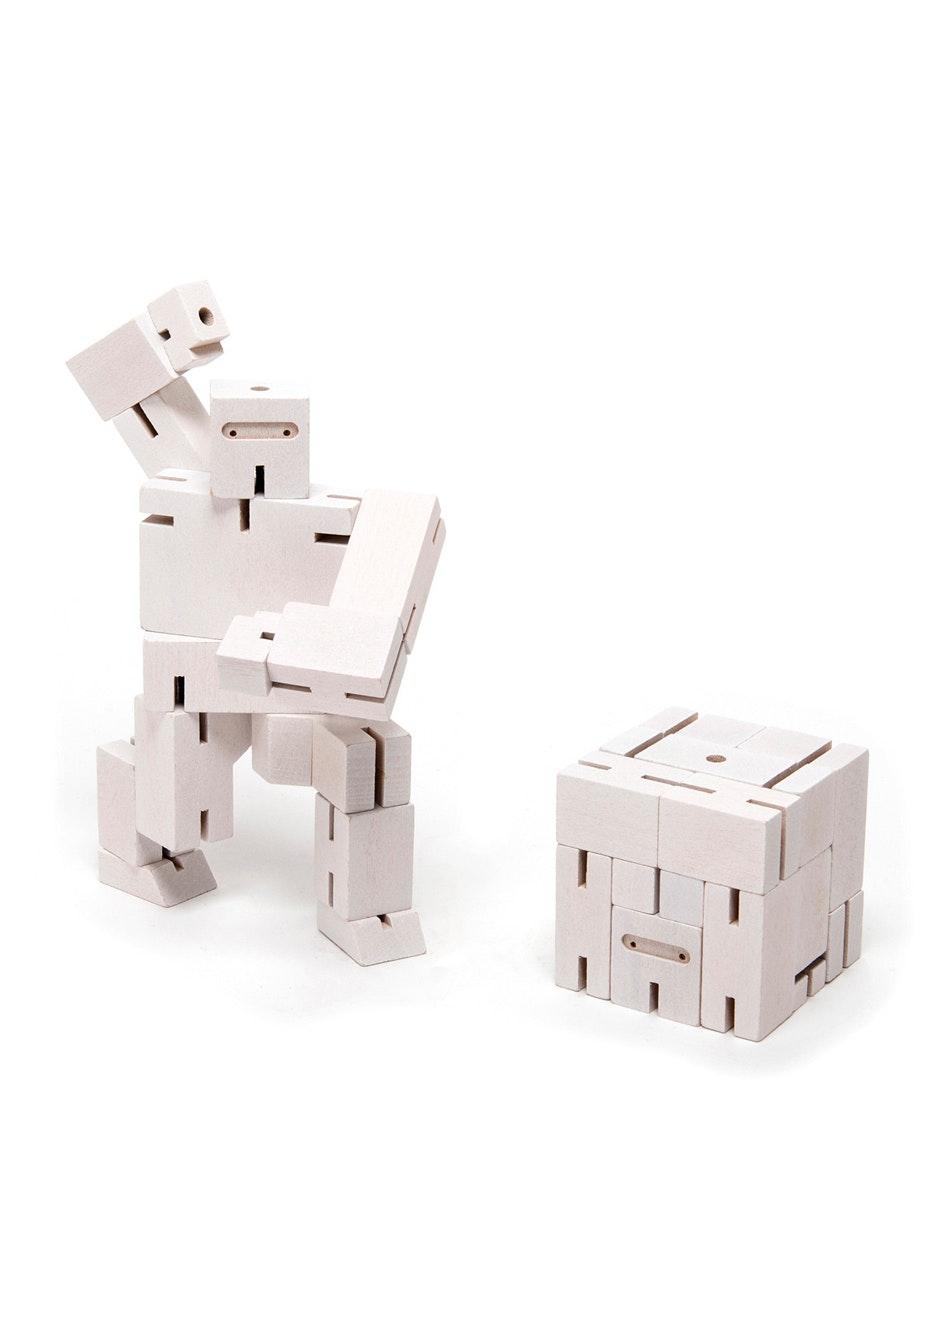 Areaware - Cubebot Small Ninja - White